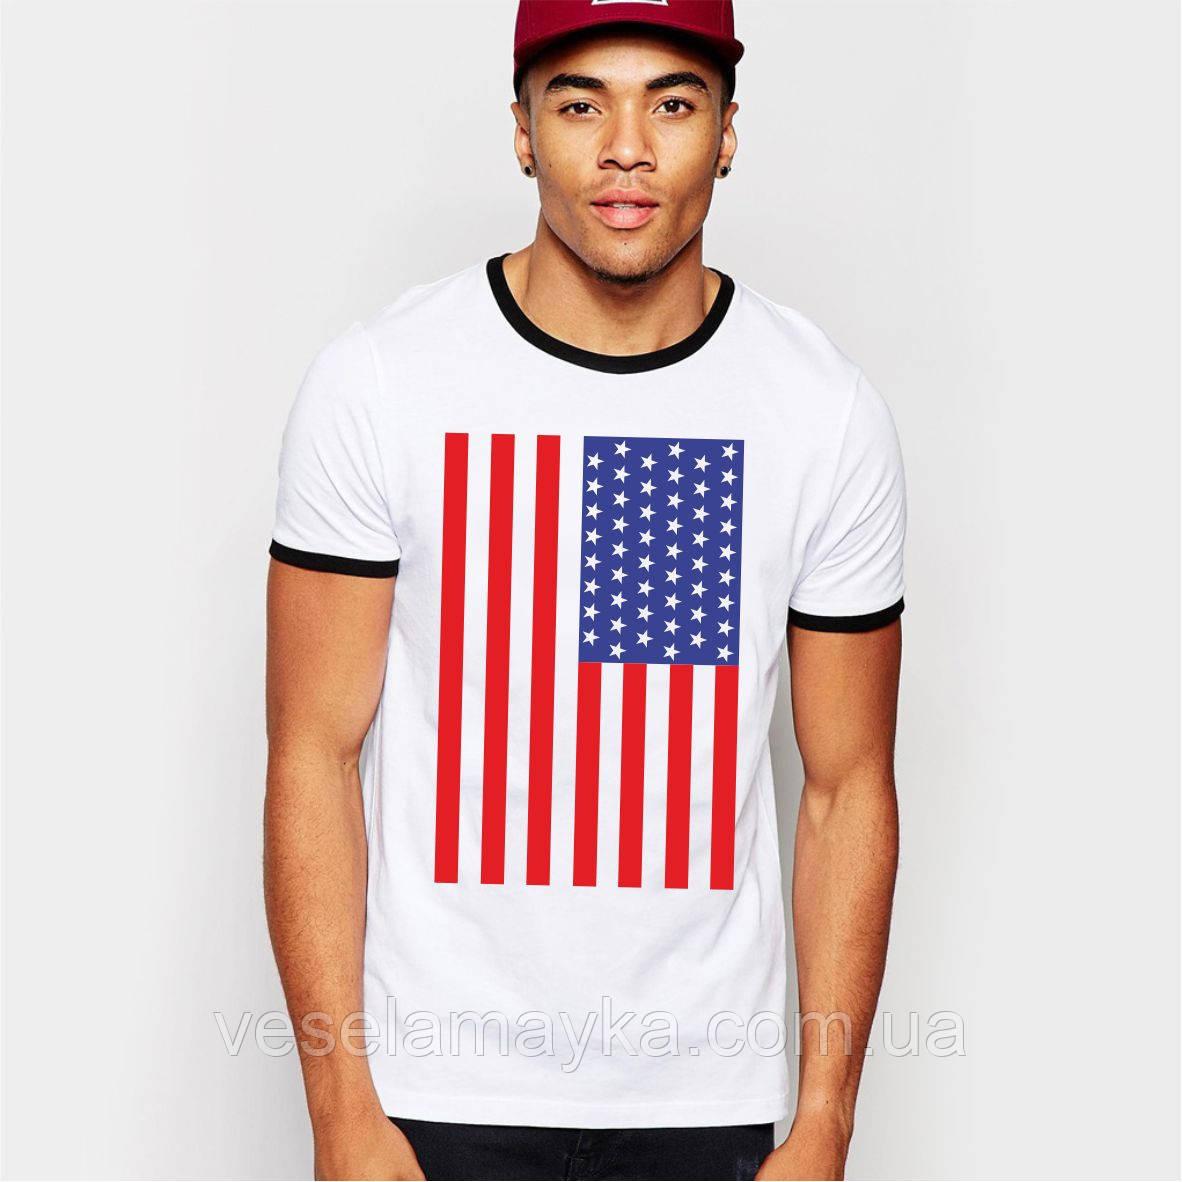 Мужская футболка Американский флаг (USA)